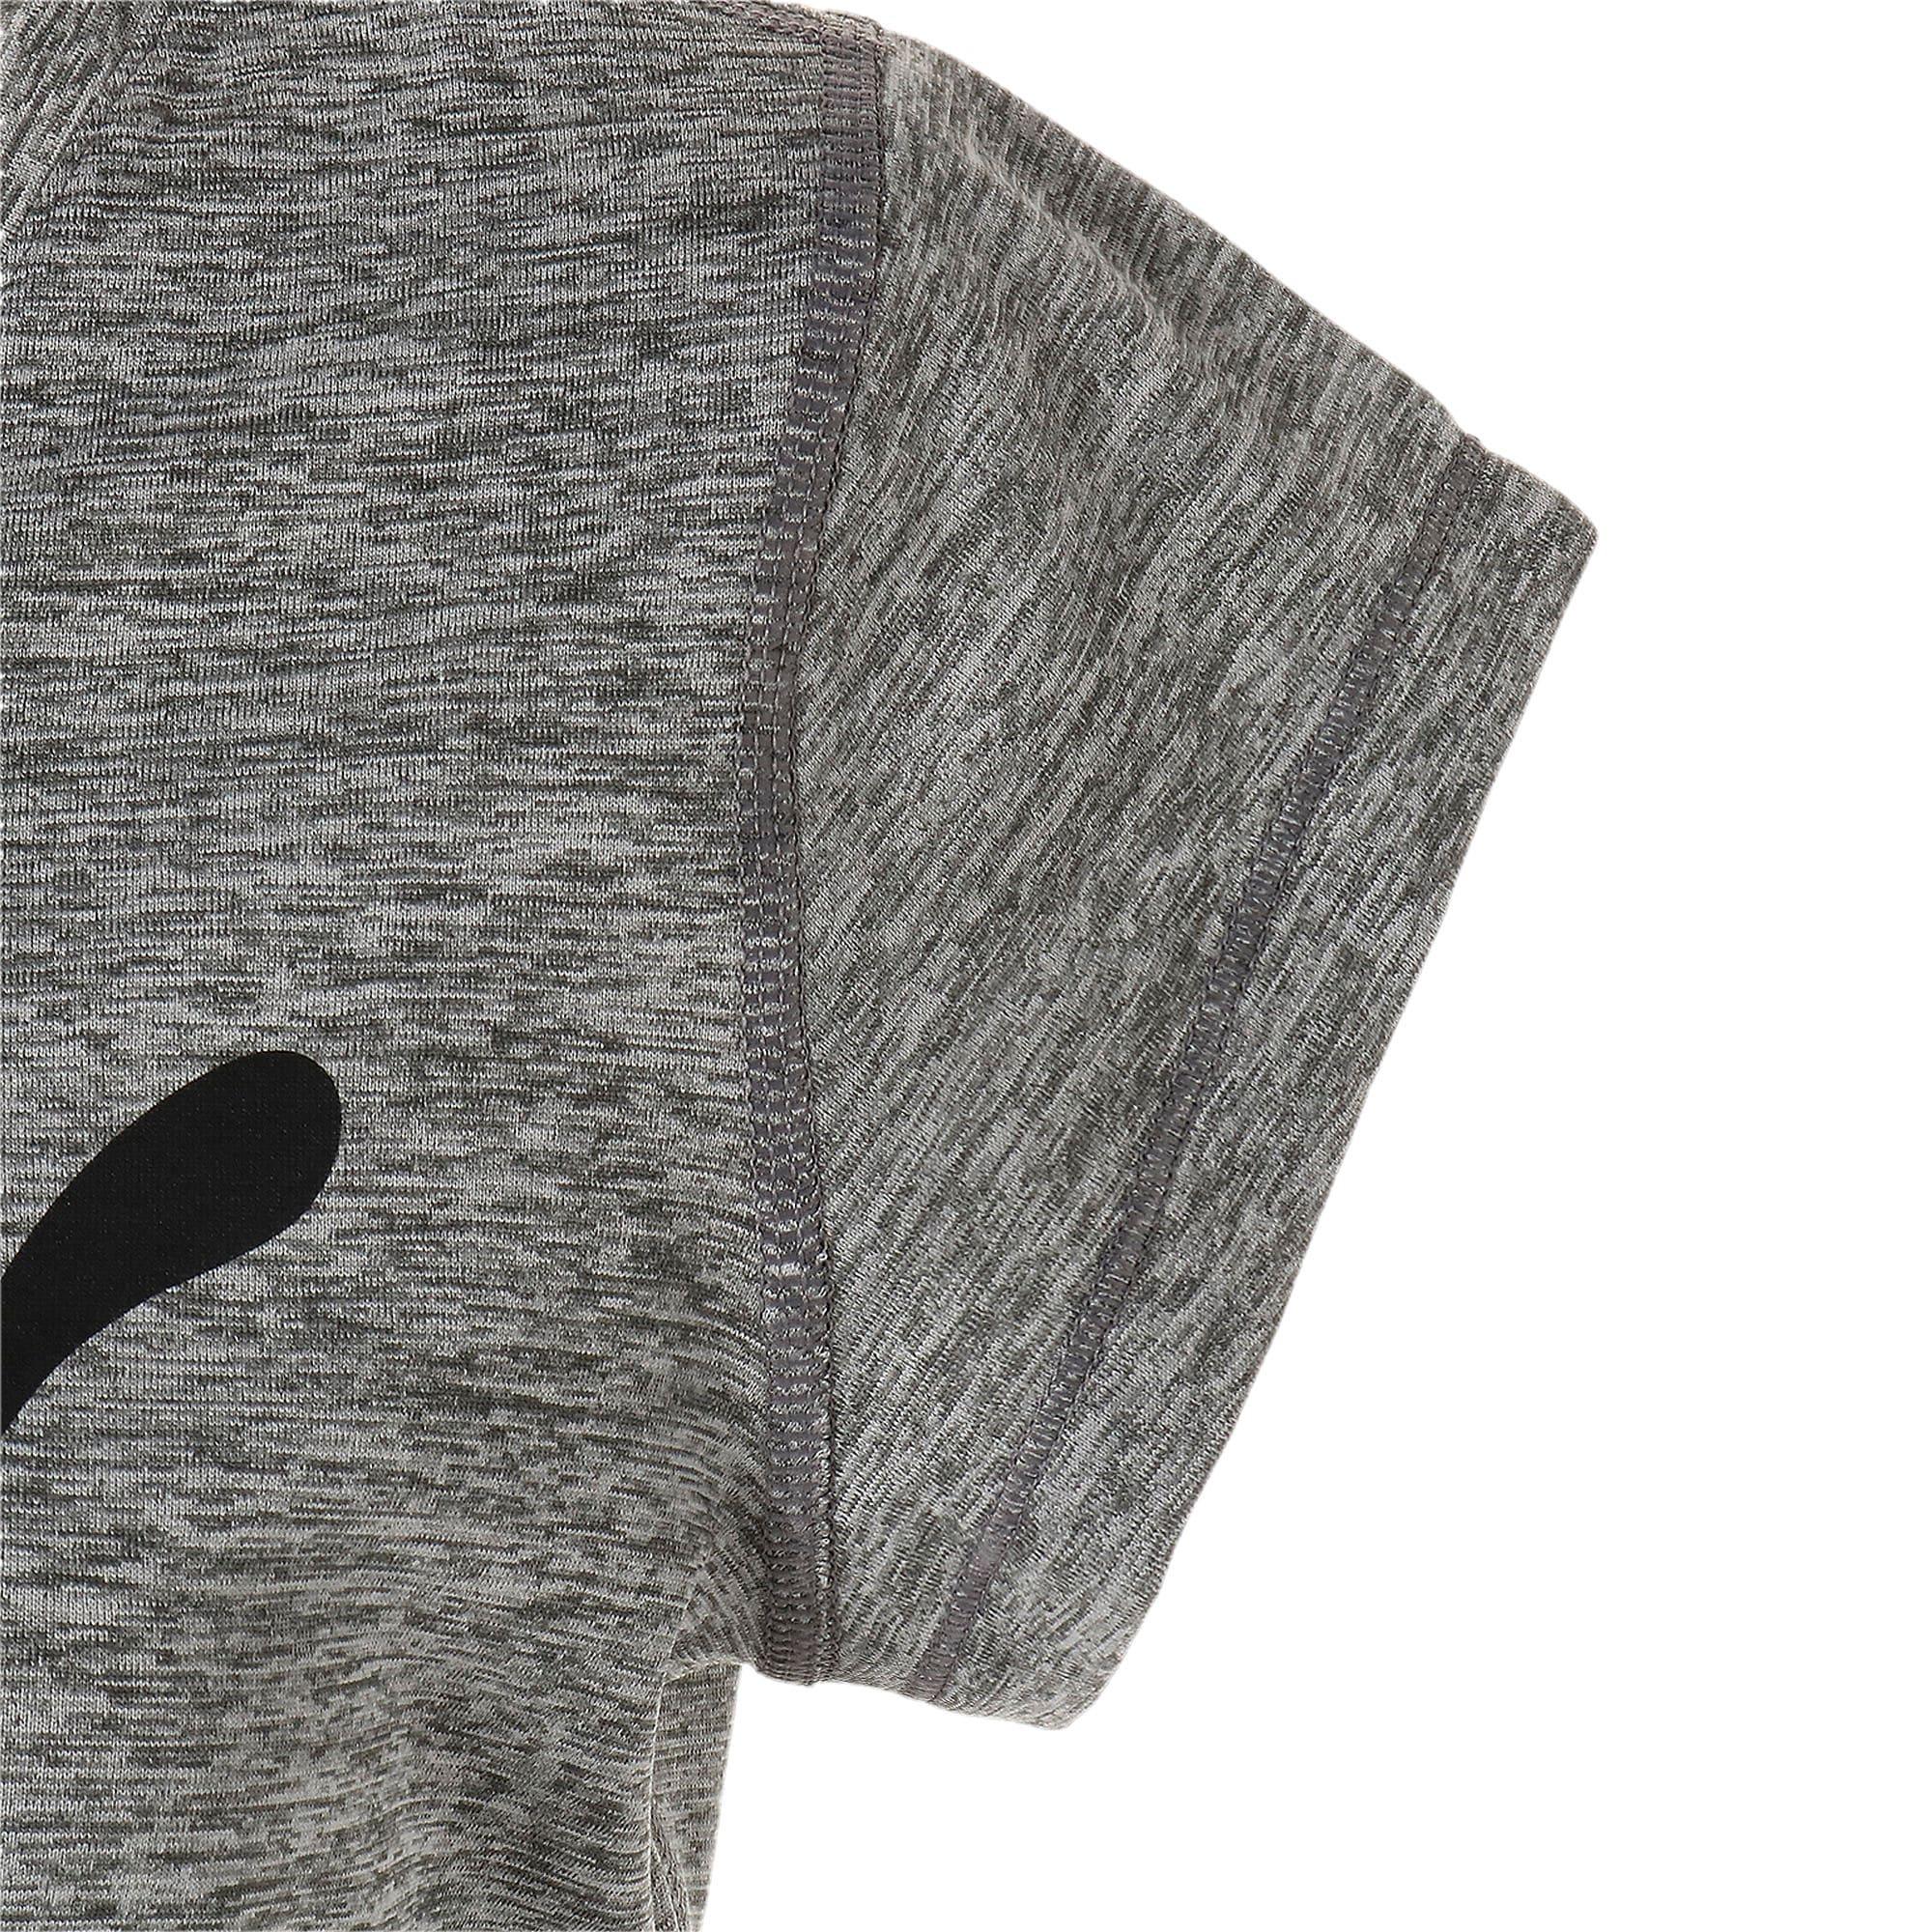 Thumbnail 7 of ヘザー キャット ウィメンズ ランニング Tシャツ 半袖, Medium Gray Heather, medium-JPN